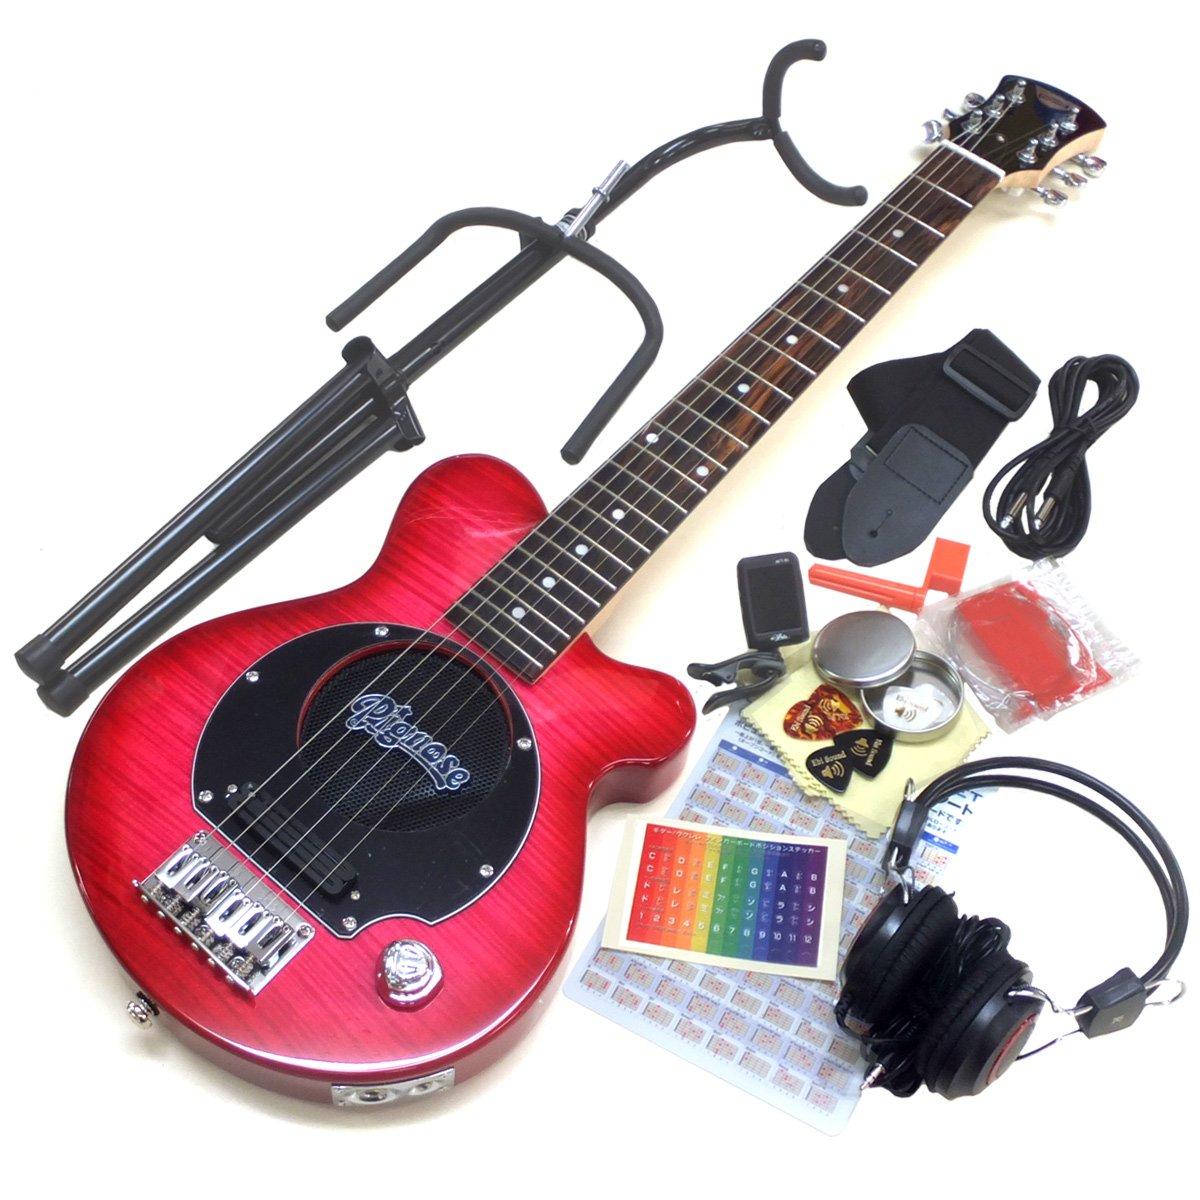 Pignose ピグノーズ ギター PGG-200FM SPK アンプ内蔵ミニギター15点セット [98765]【検品後発送で安心】   B00SOEISAI